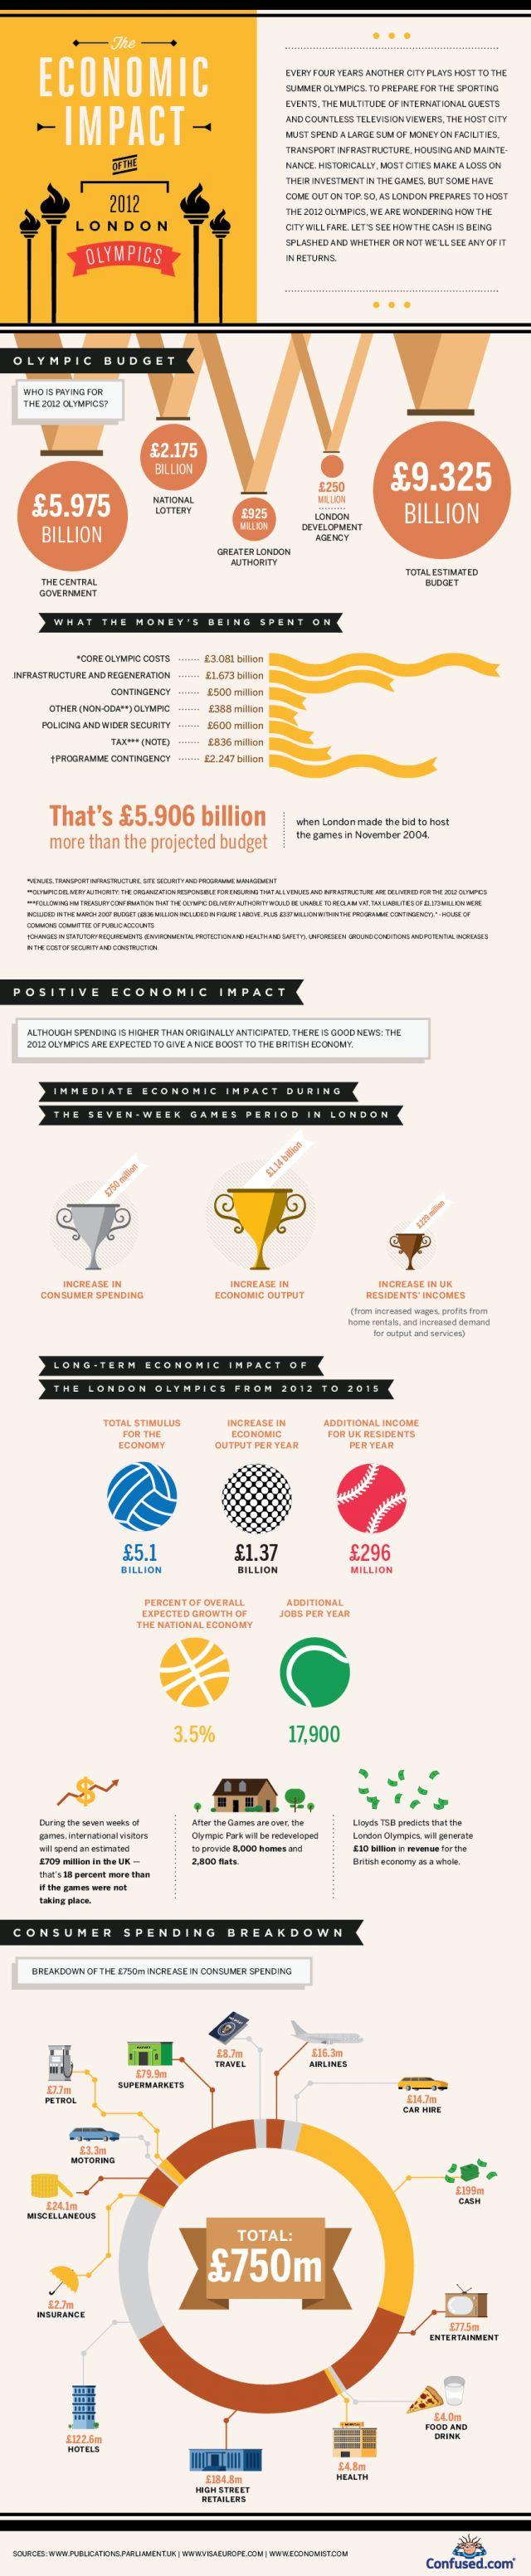 Economic Impact of the 2012 London Olympics [ #infographic]